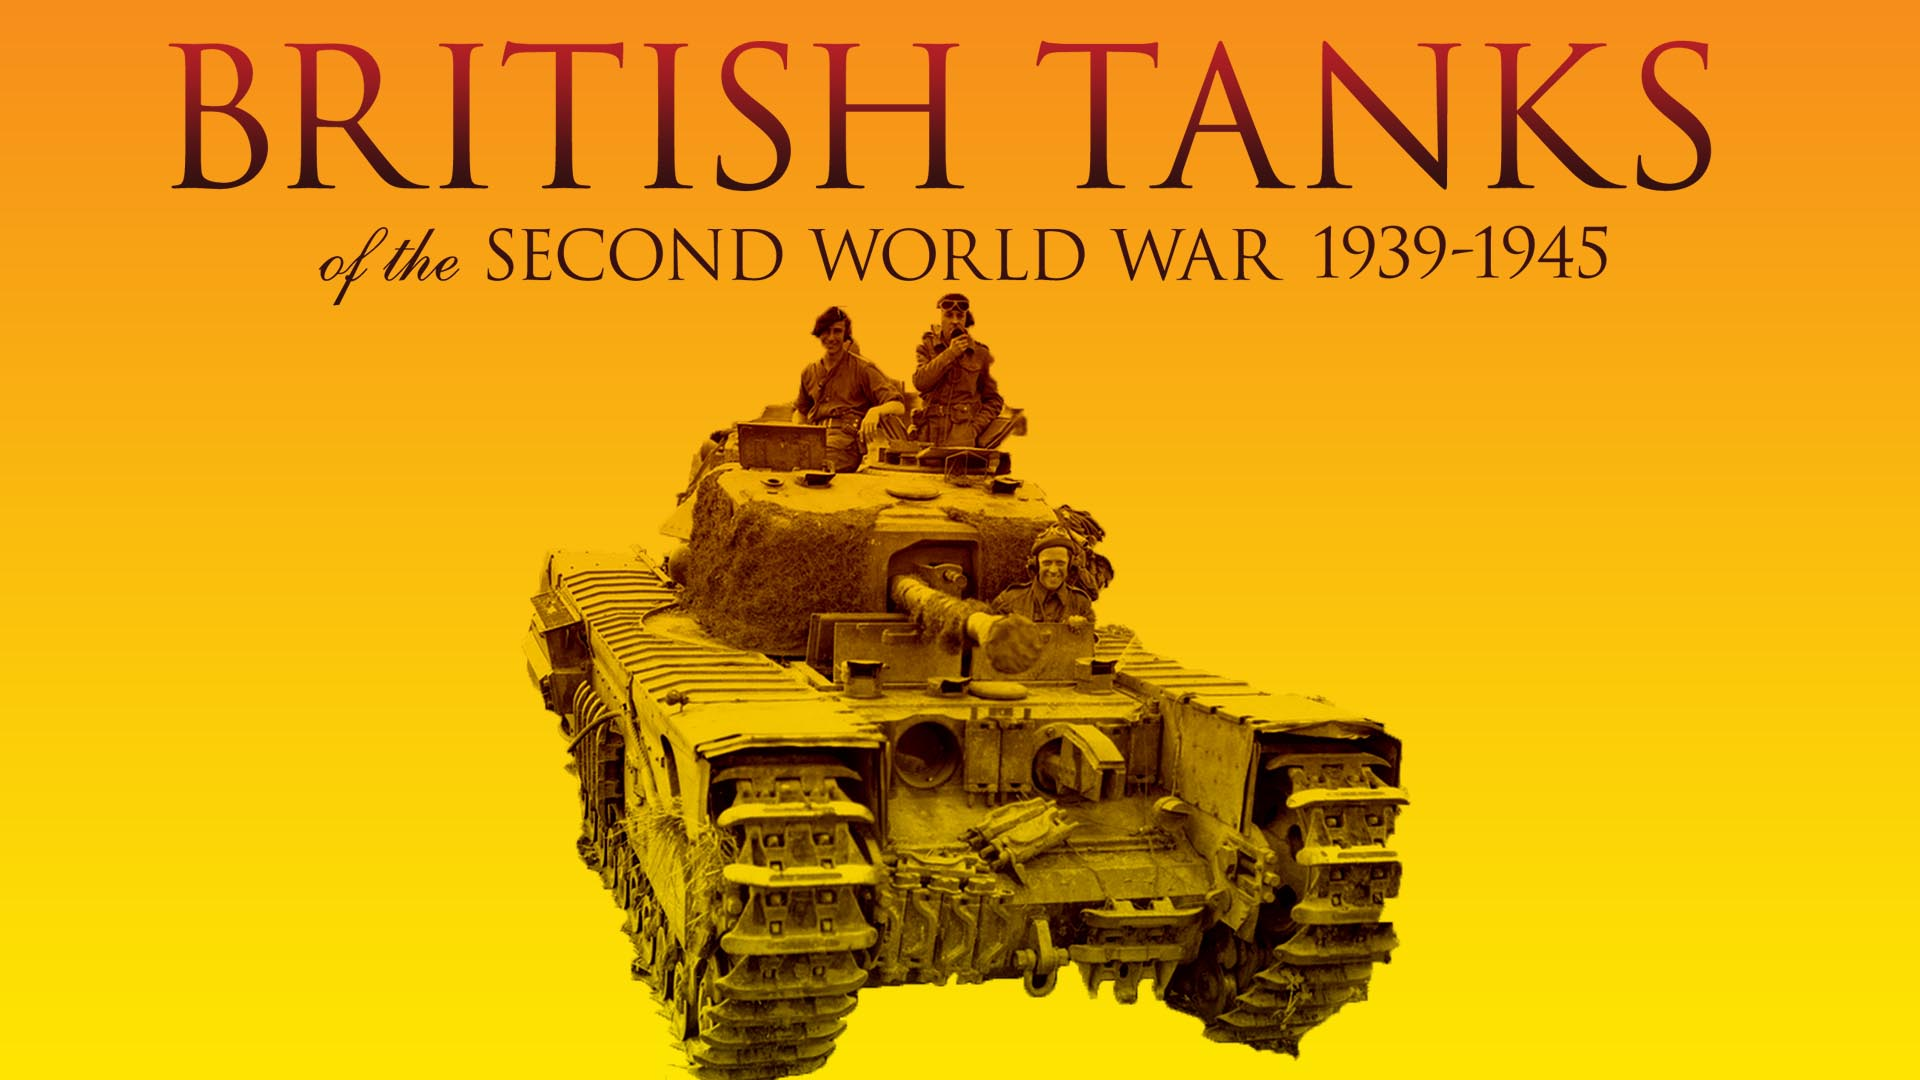 British Tanks of the Second World War 1939 - 1945 -